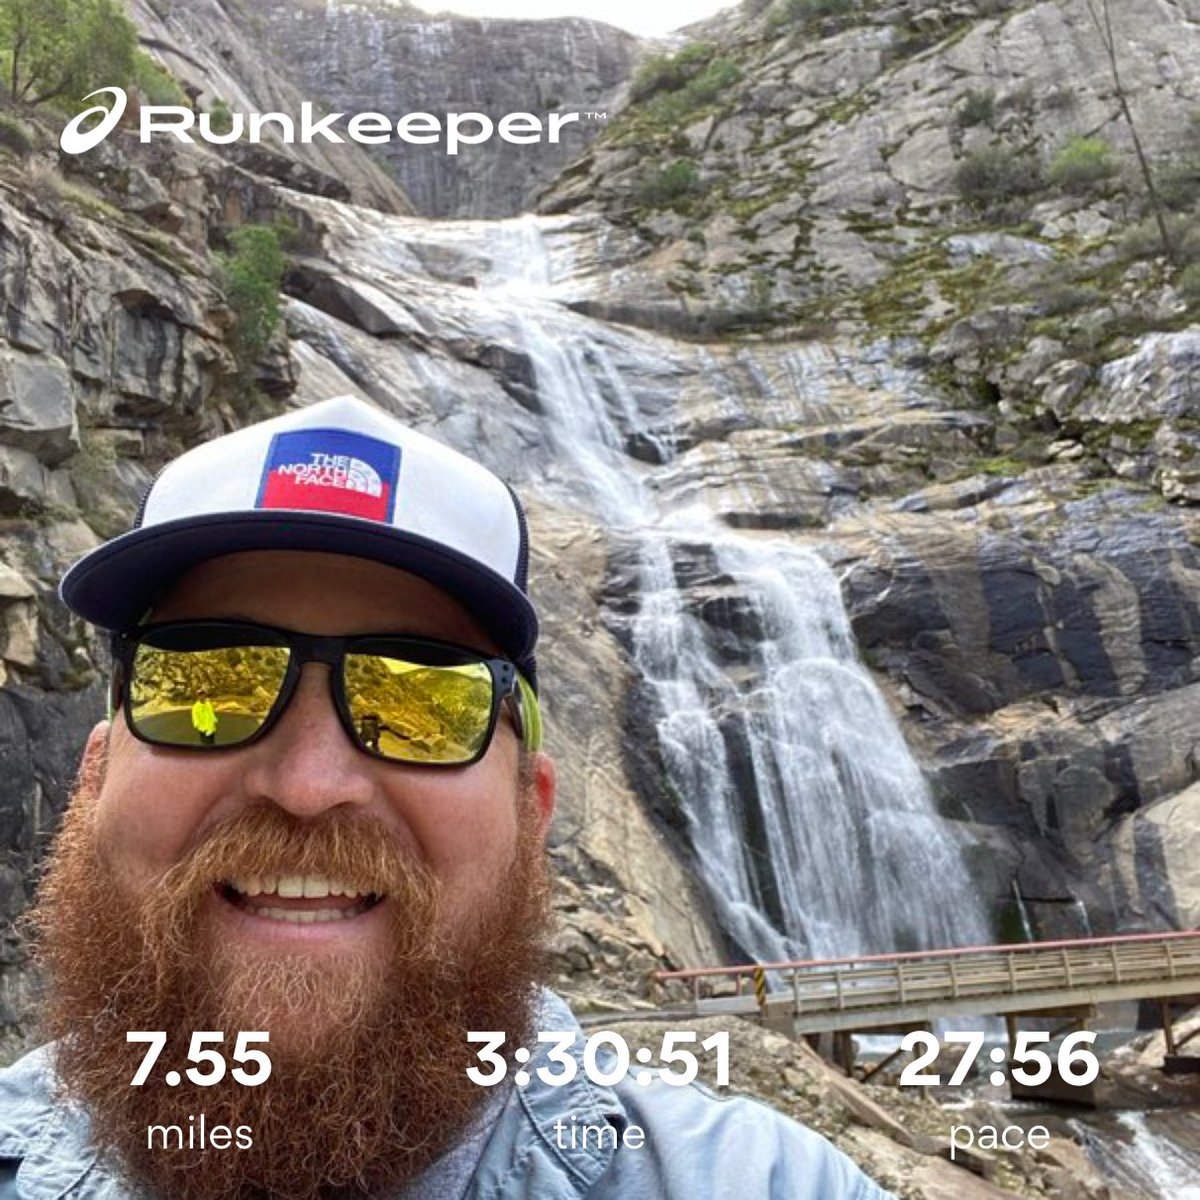 Fun hike to Stevenson Creek Waterfall on million dollar road. #SocialDistanacing #getoutsideresponsibly #getoutside #hikecalifornia #hikingadventure #hiking #staysafepic.twitter.com/paLkFBroc1